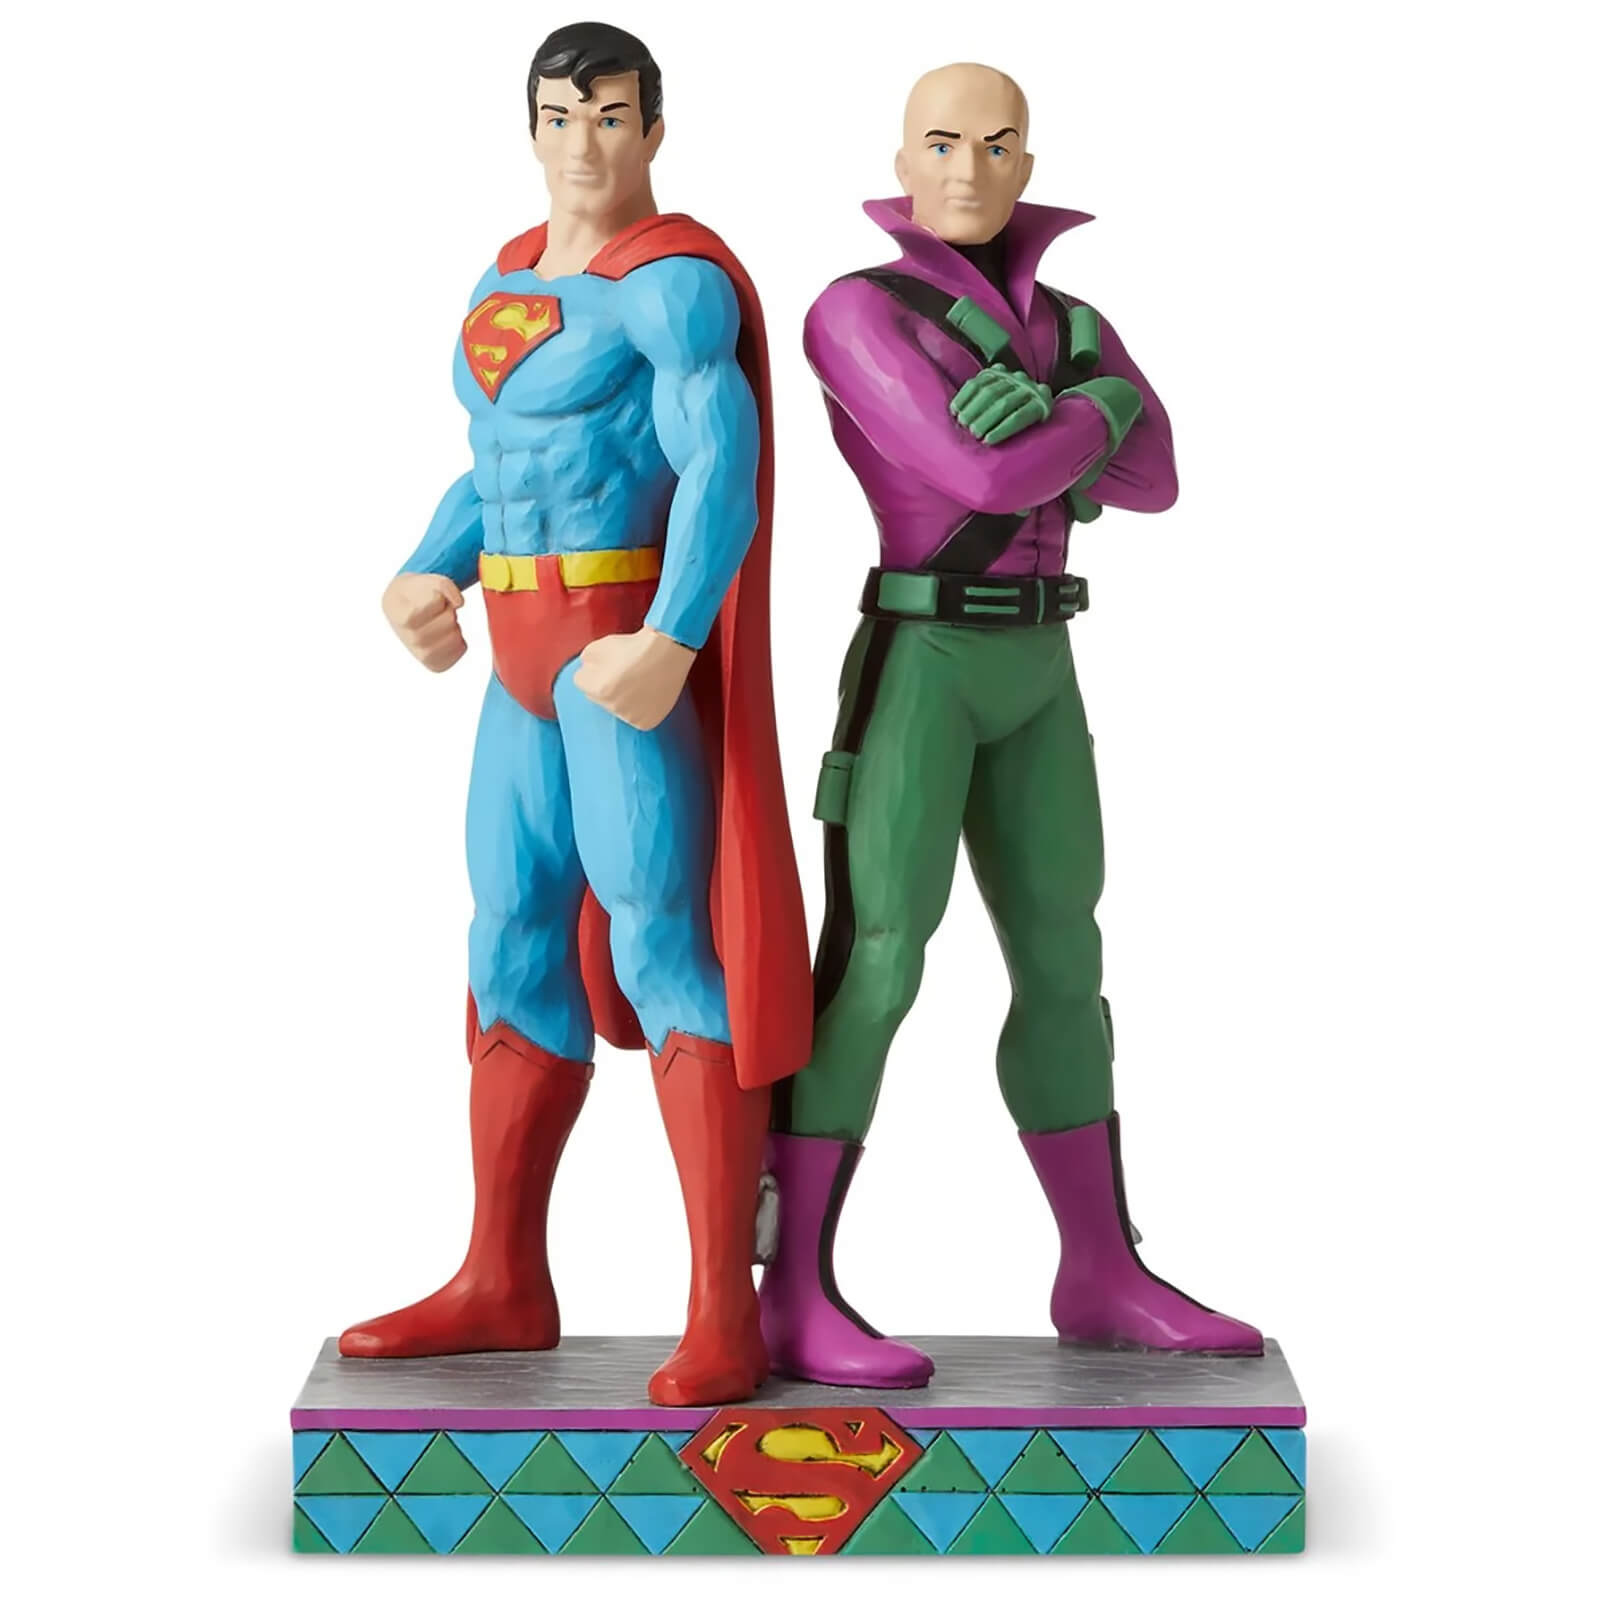 Image of DC Comics by Jim Shore Superman™ vs Lex Luther Figurine 21.5cm